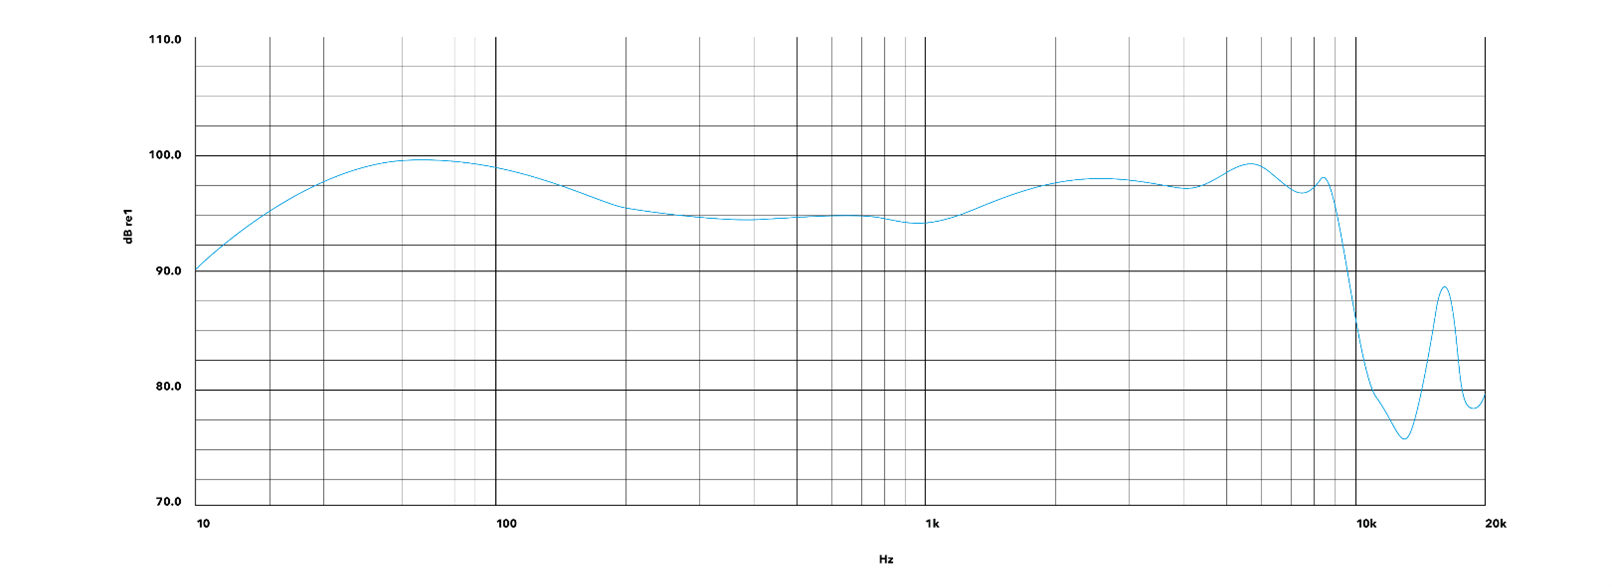 TrueControl ANC frequency response graph